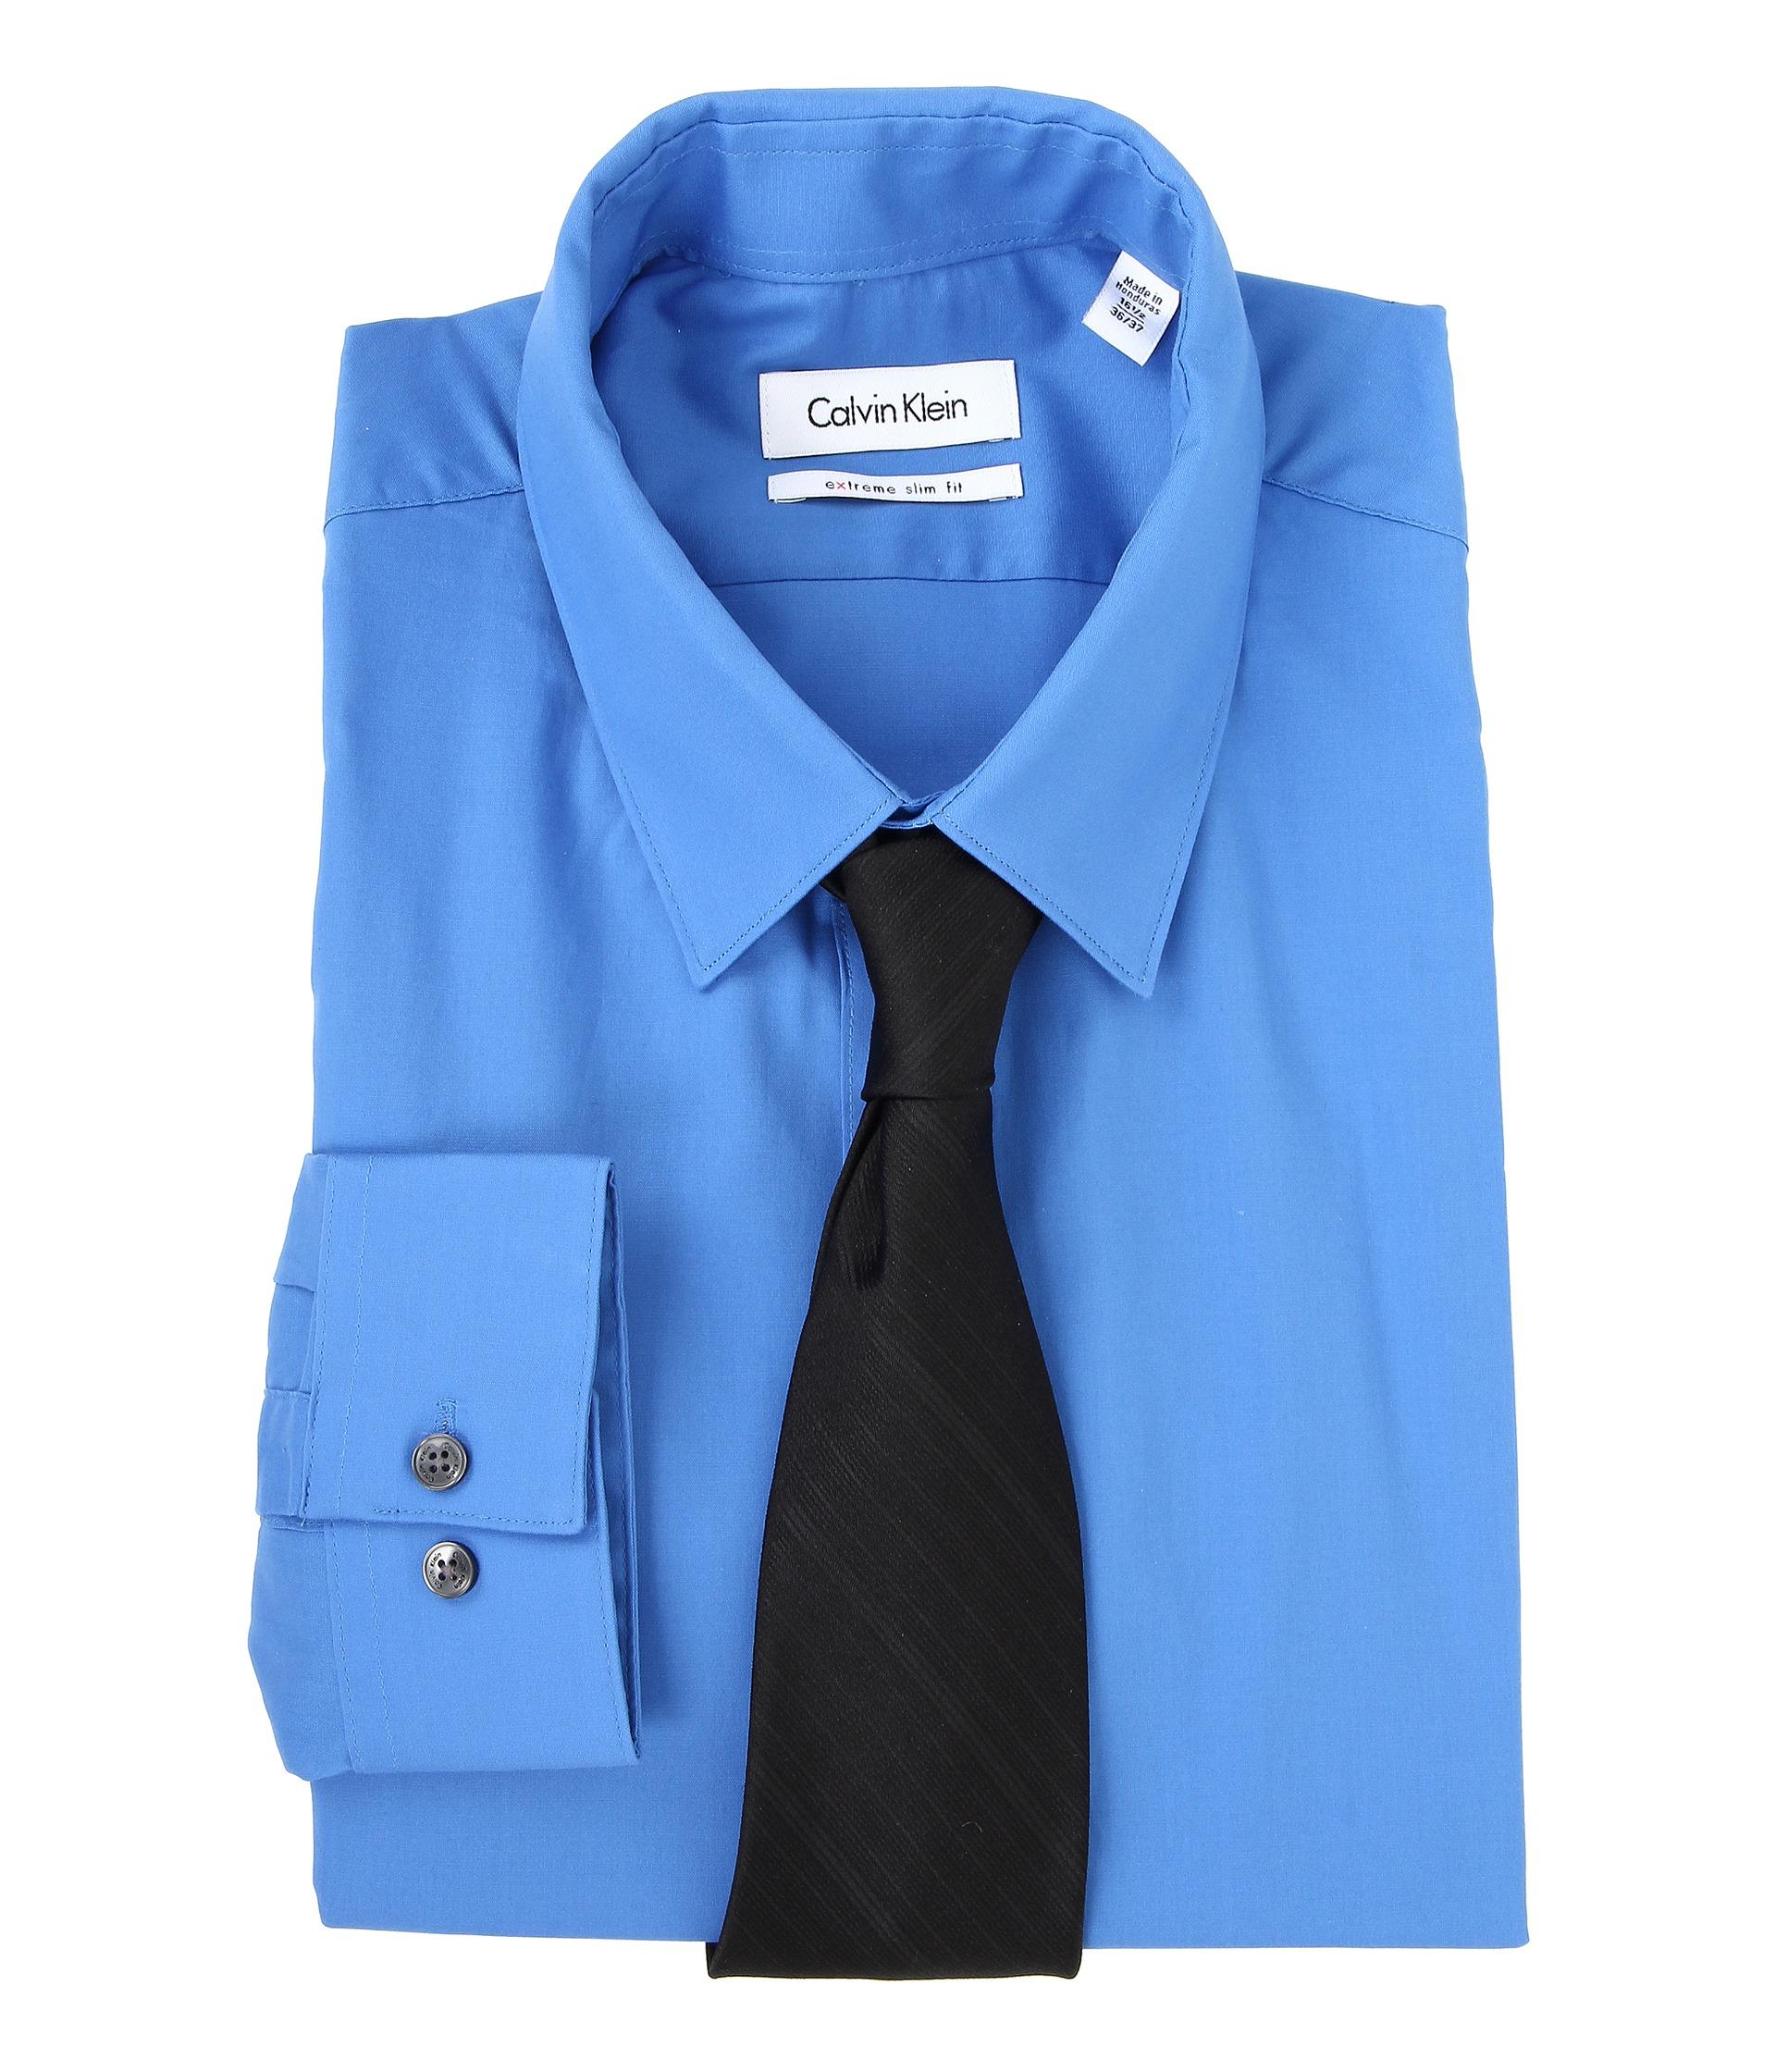 Calvin klein extreme slim fit driverlayer search engine for Calvin klein x fit dress shirt